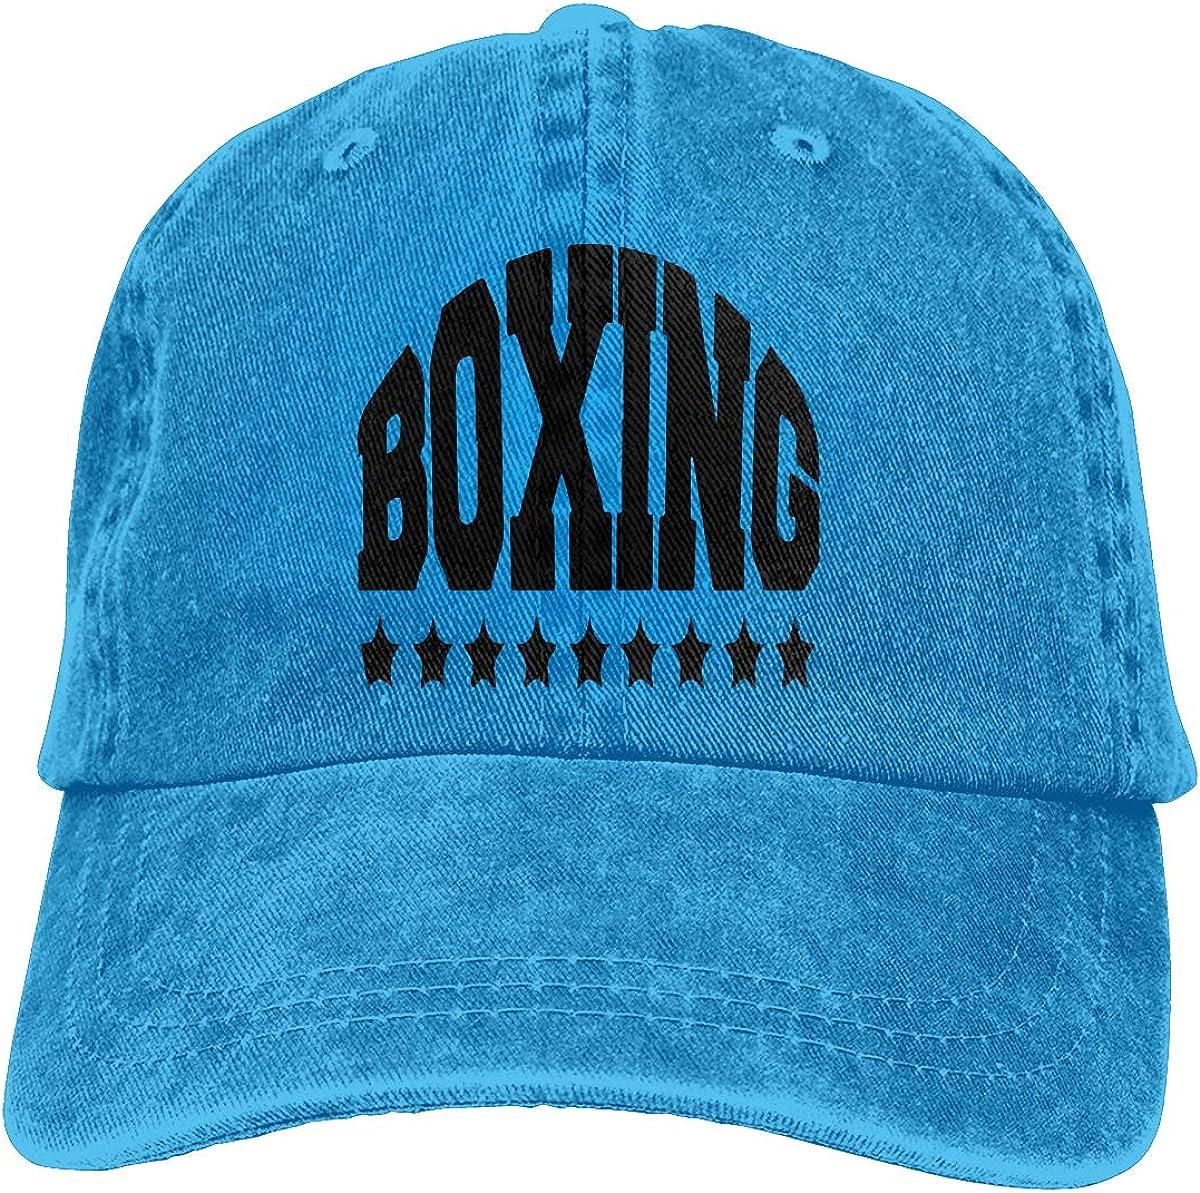 PMGM-C Boxing Unisex Trendy Jeans Outdoor Sports Hat Adjustable Baseball Cap